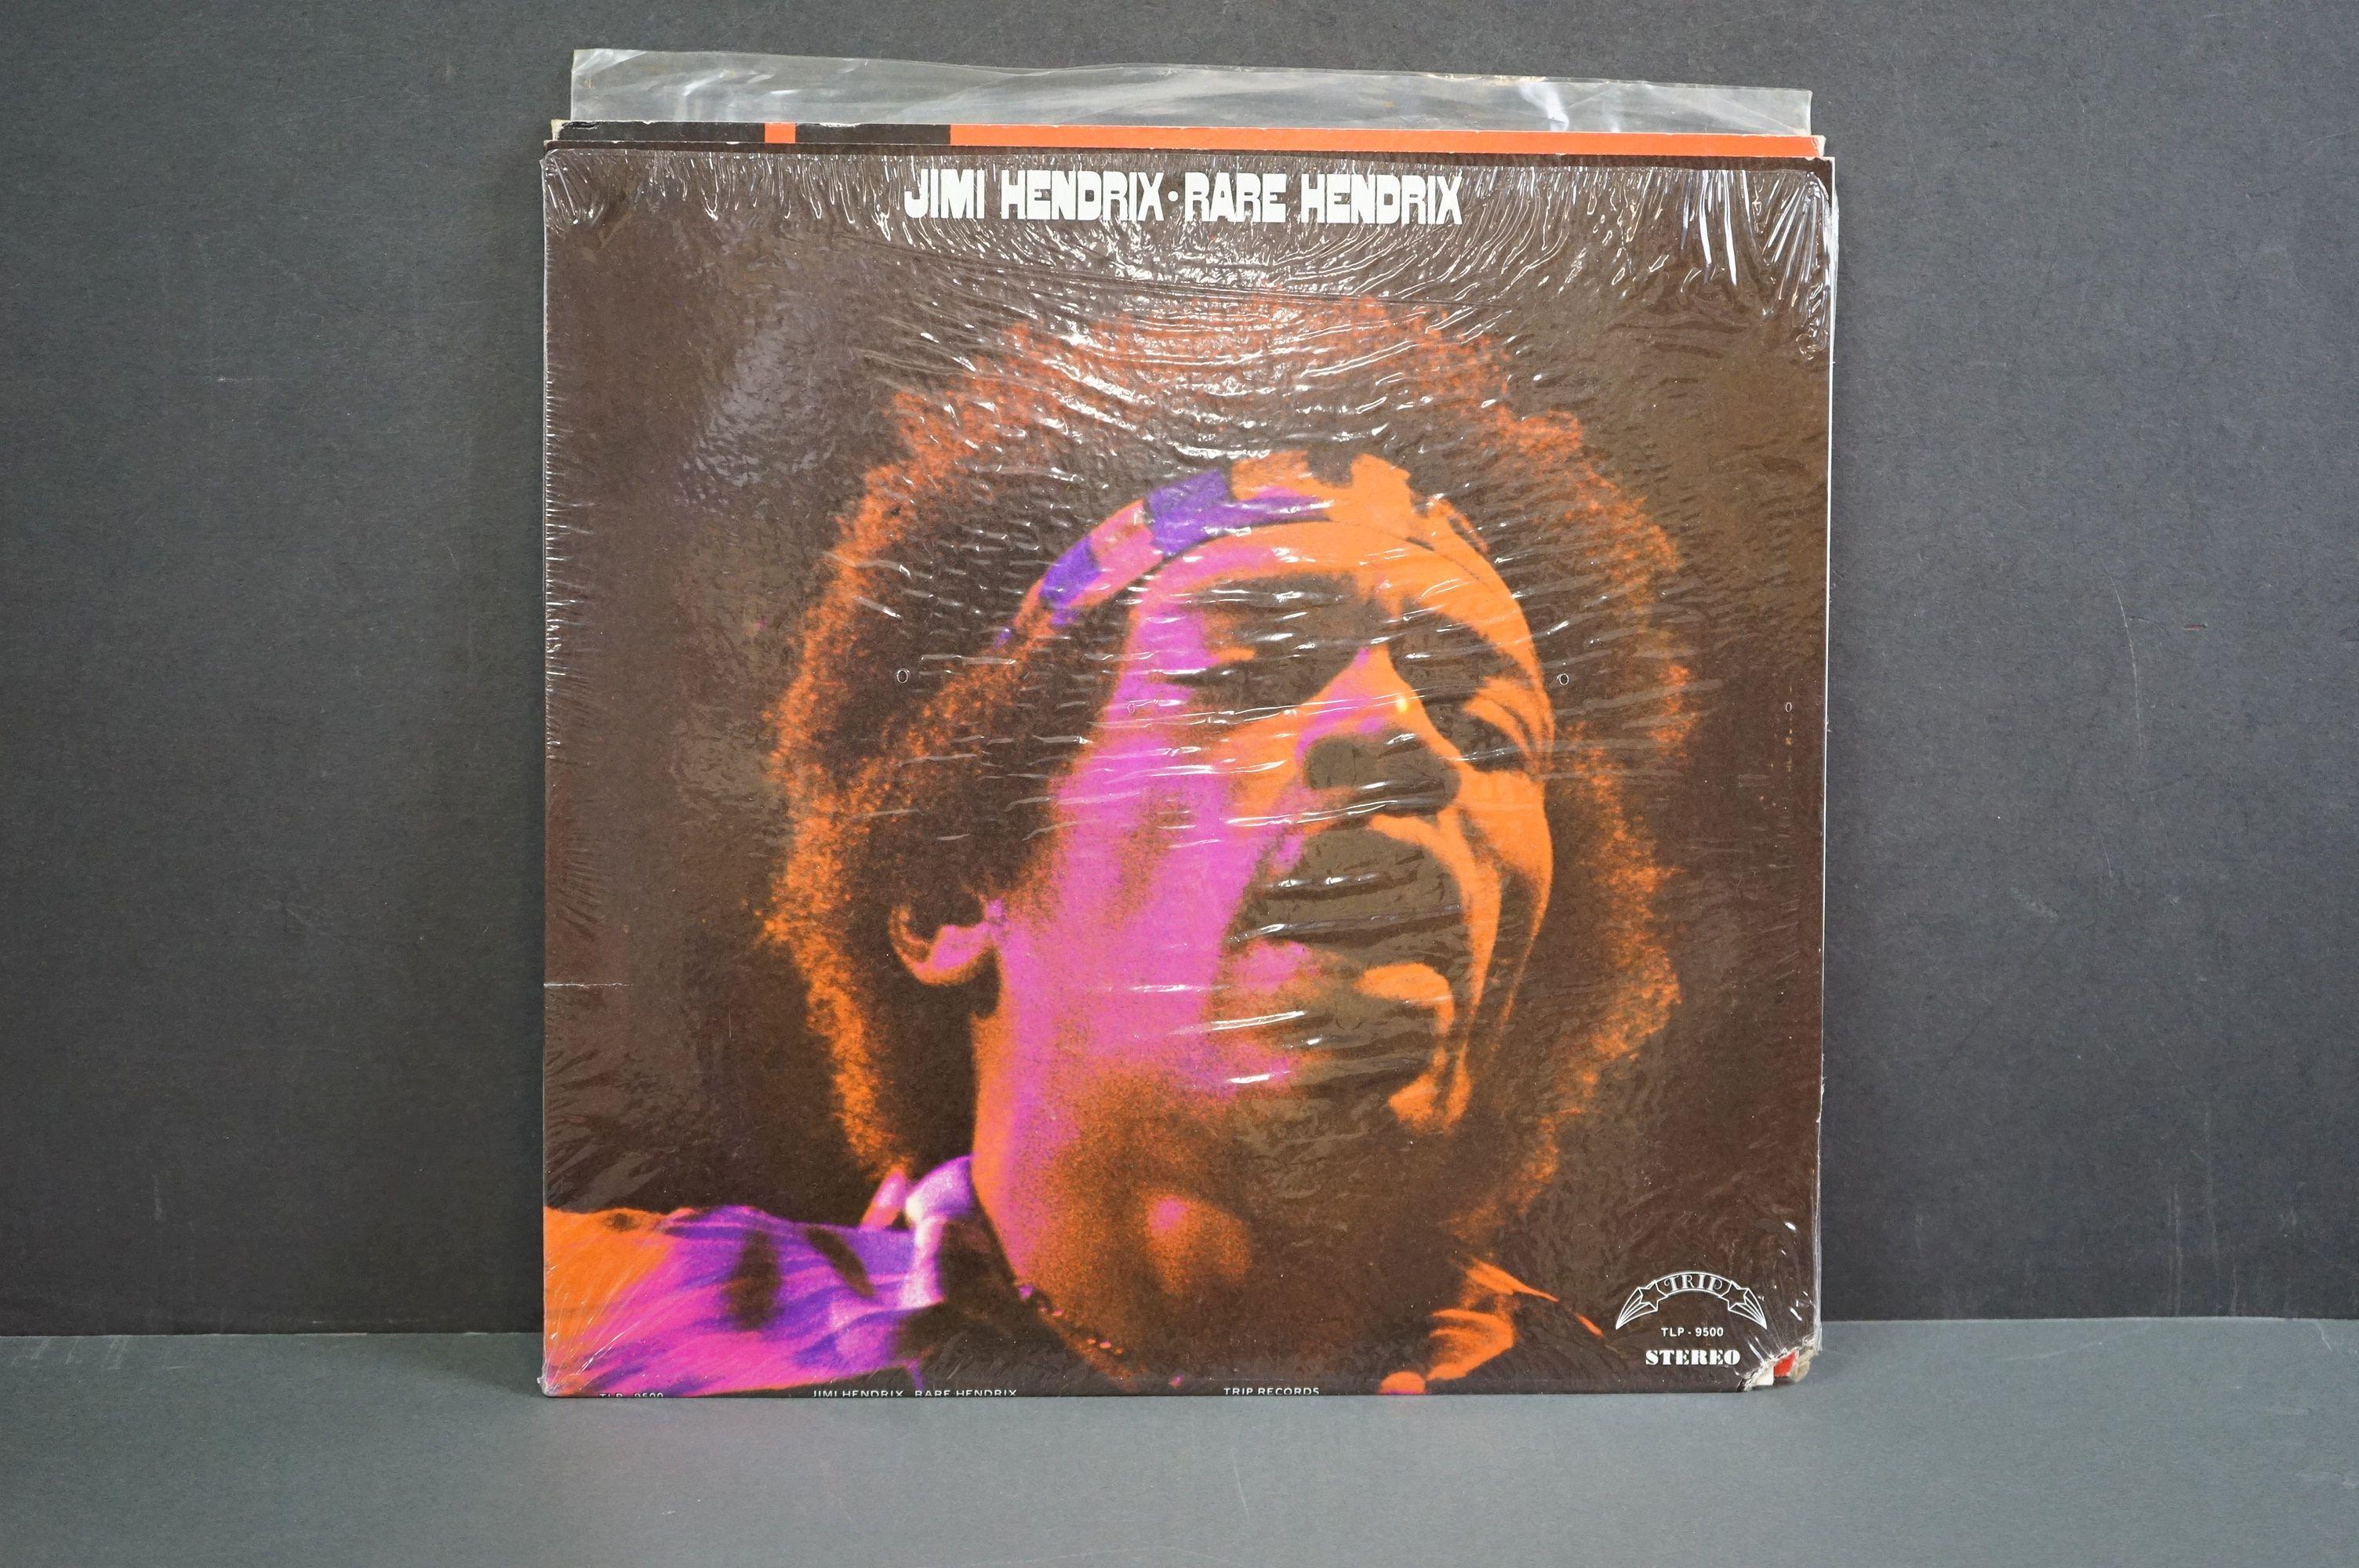 Vinyl - Nine Jimi Hendrix LPs to include Smash Hits, Hey Joe (Italian pressing), Stone Free, Jimi - Image 8 of 9